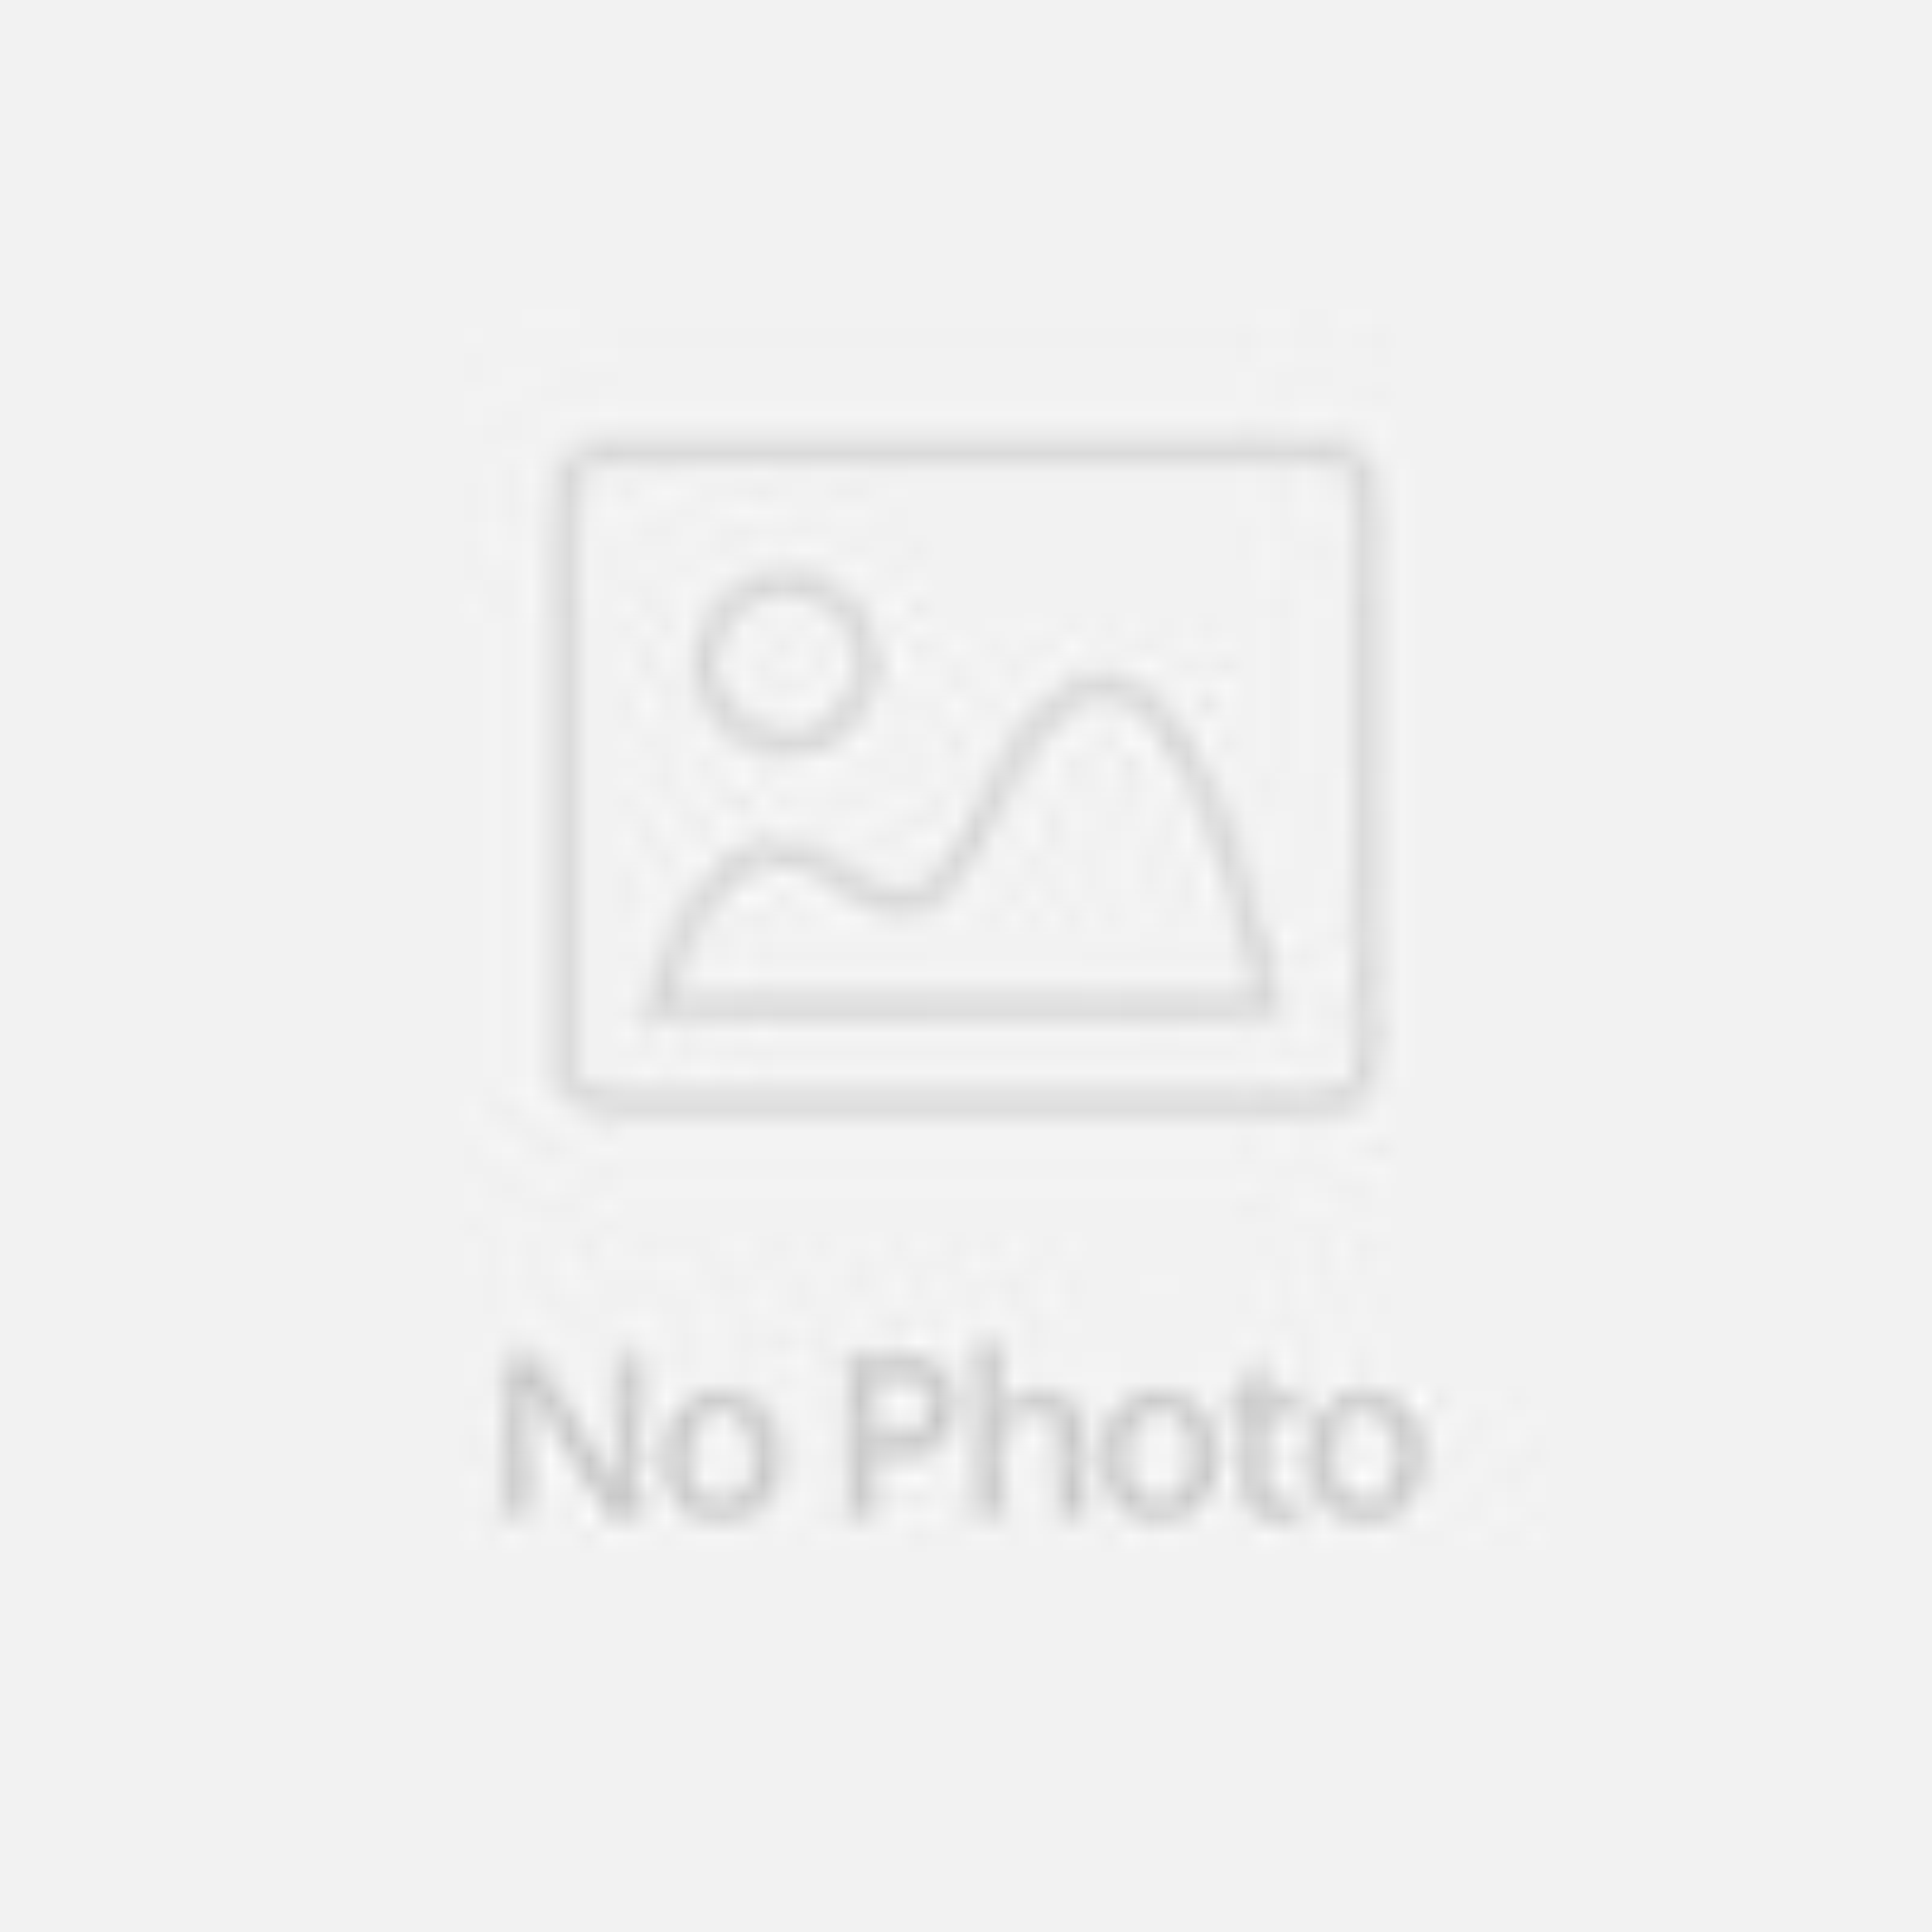 XCY X-26X 1 pcs Big Promotion!!! HD Graphics Intel Nm70 Express Graphics Cores fanless mini computer x86 mini htpc mini pc linux(China (Mainland))